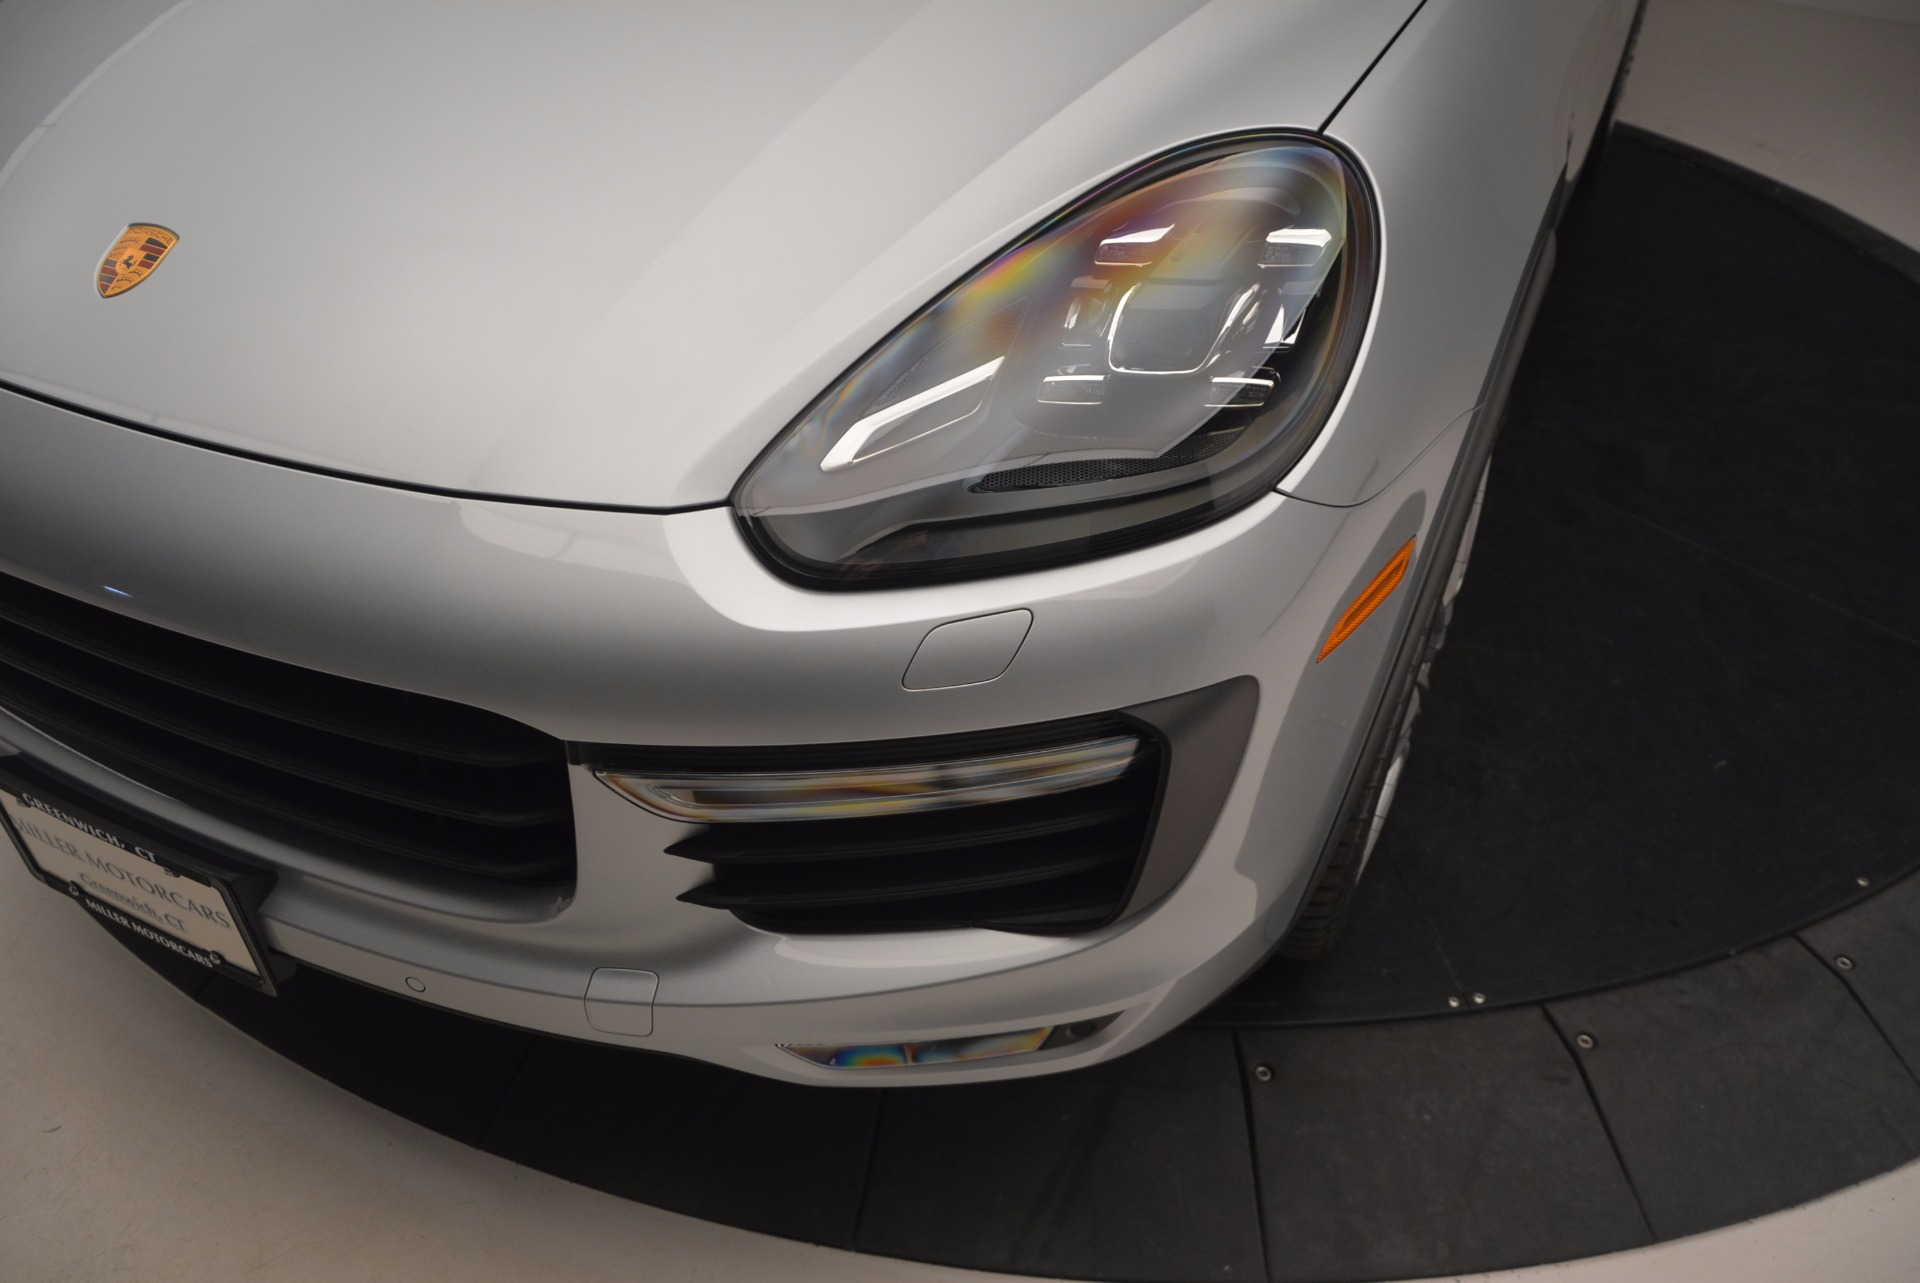 Used 2016 Porsche Cayenne Turbo For Sale In Westport, CT 1000_p14